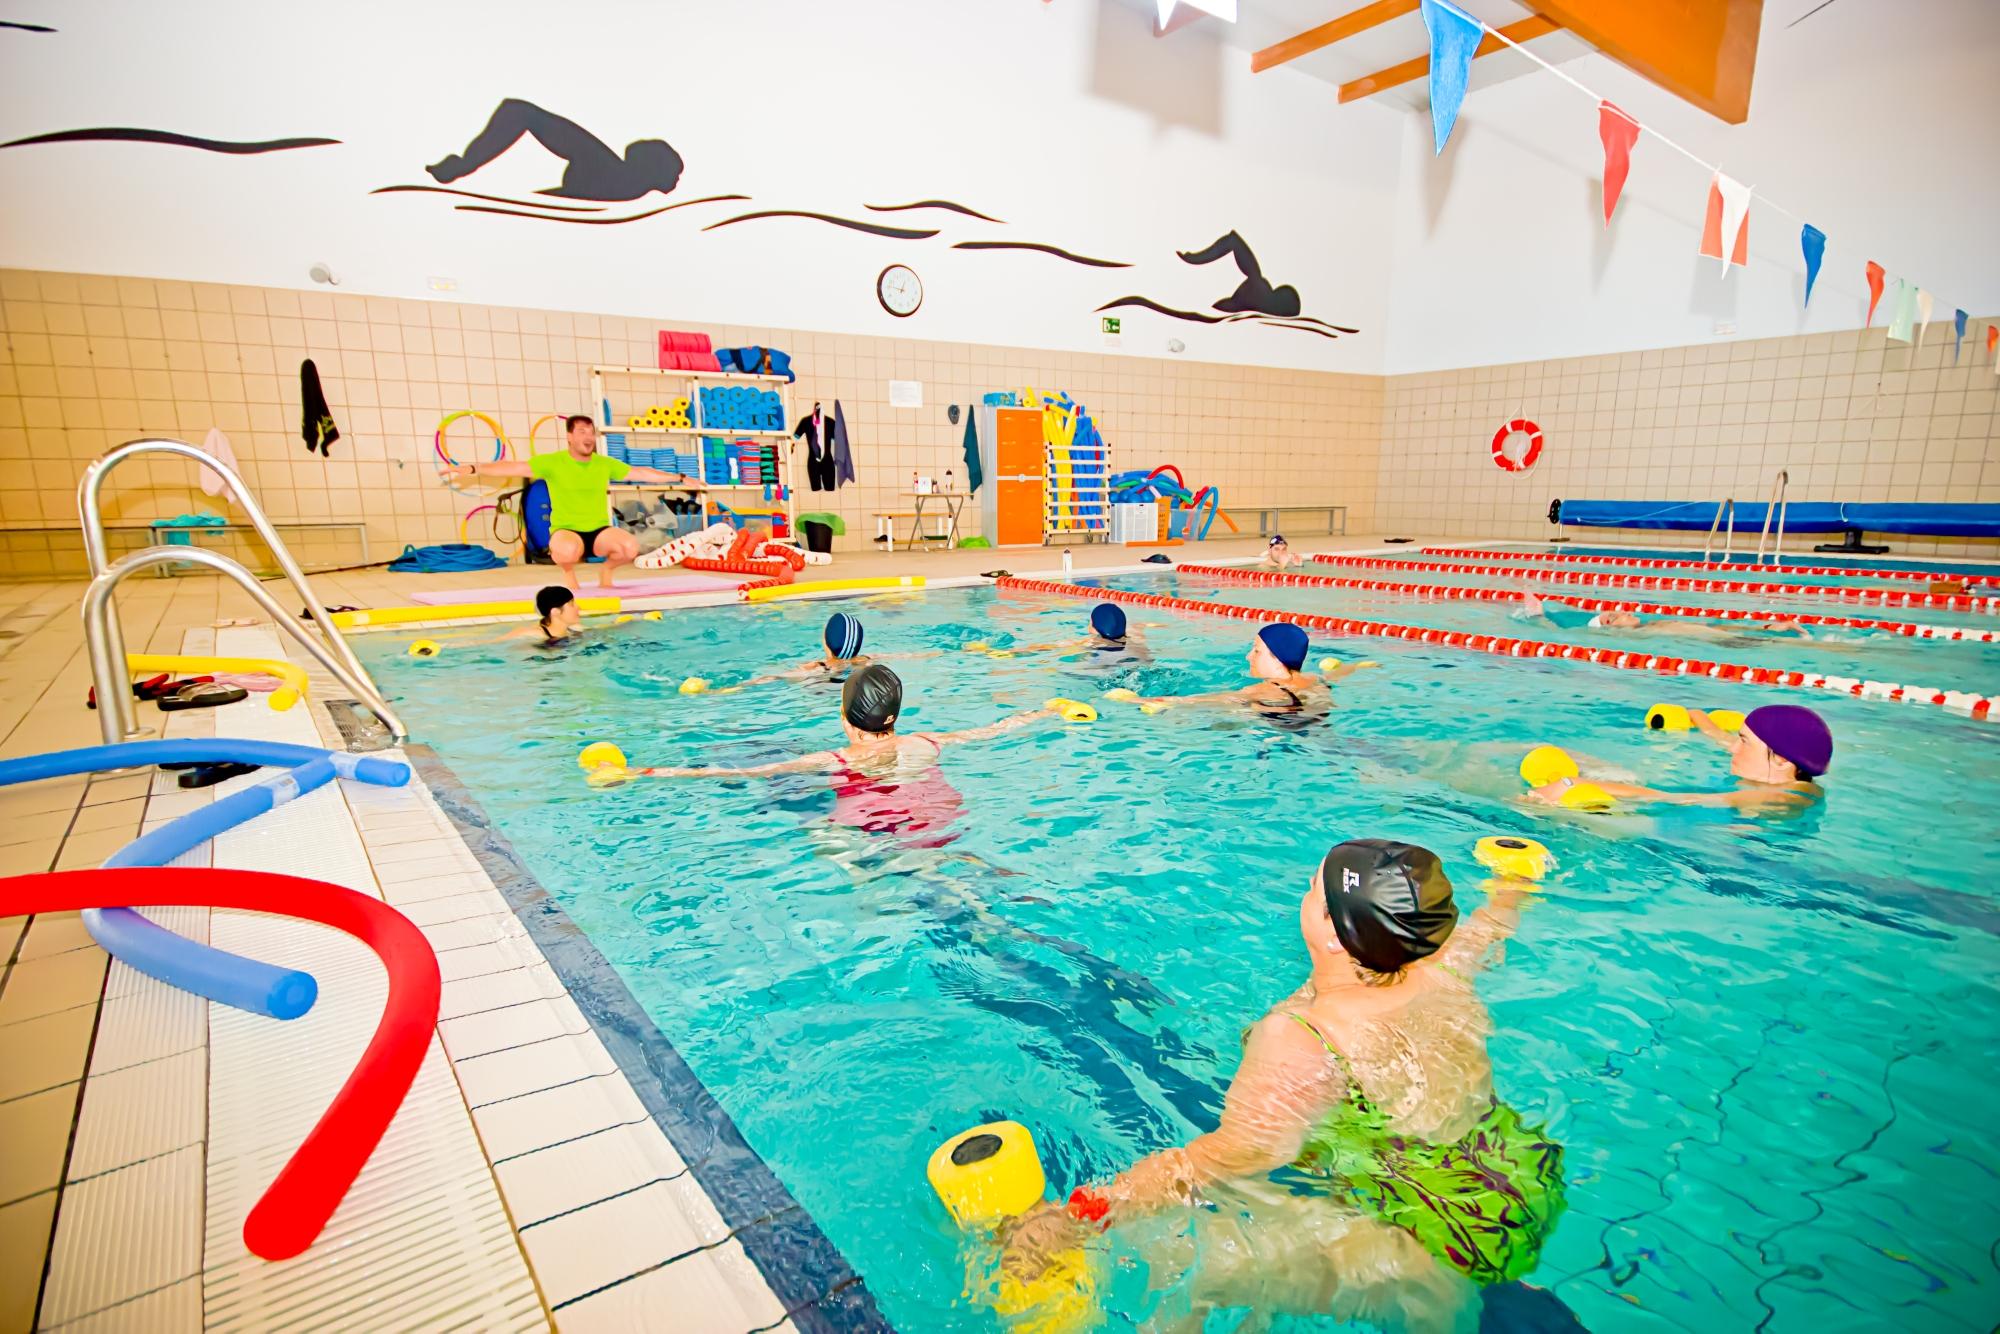 Actividades dirigidas en piscina deportes alcal la real for Piscina cubierta alcala la real